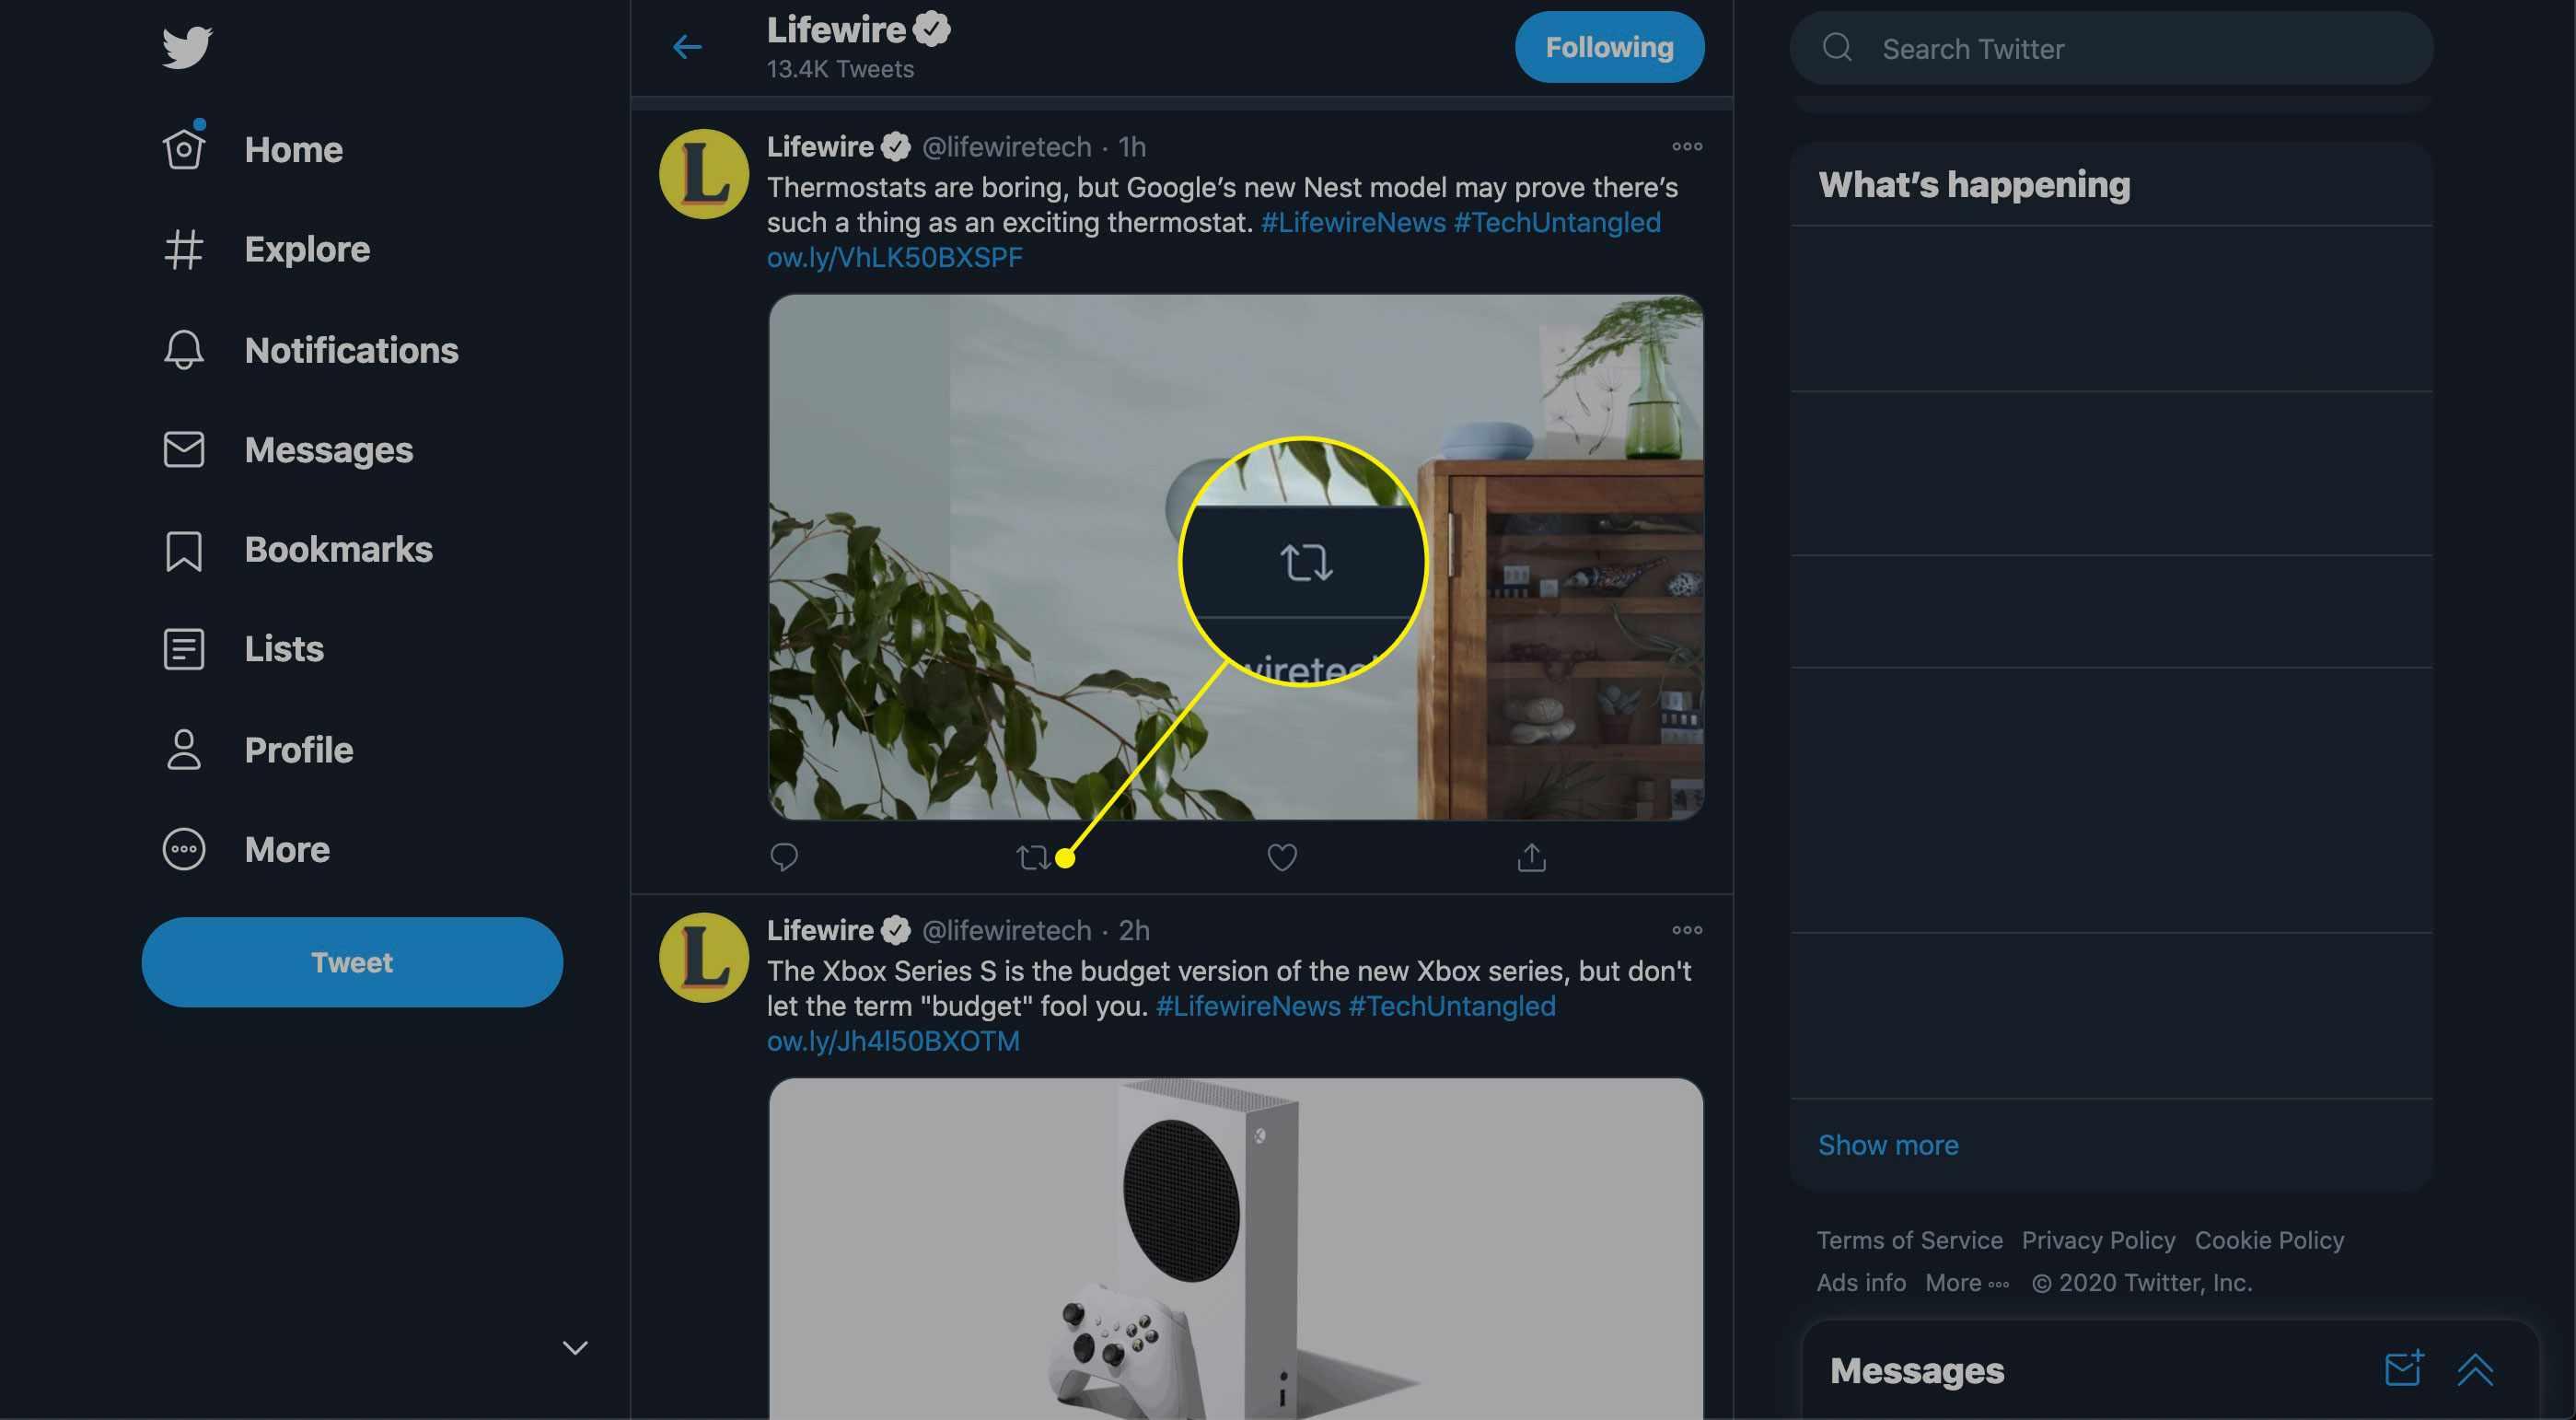 The Retweet button on Twitter